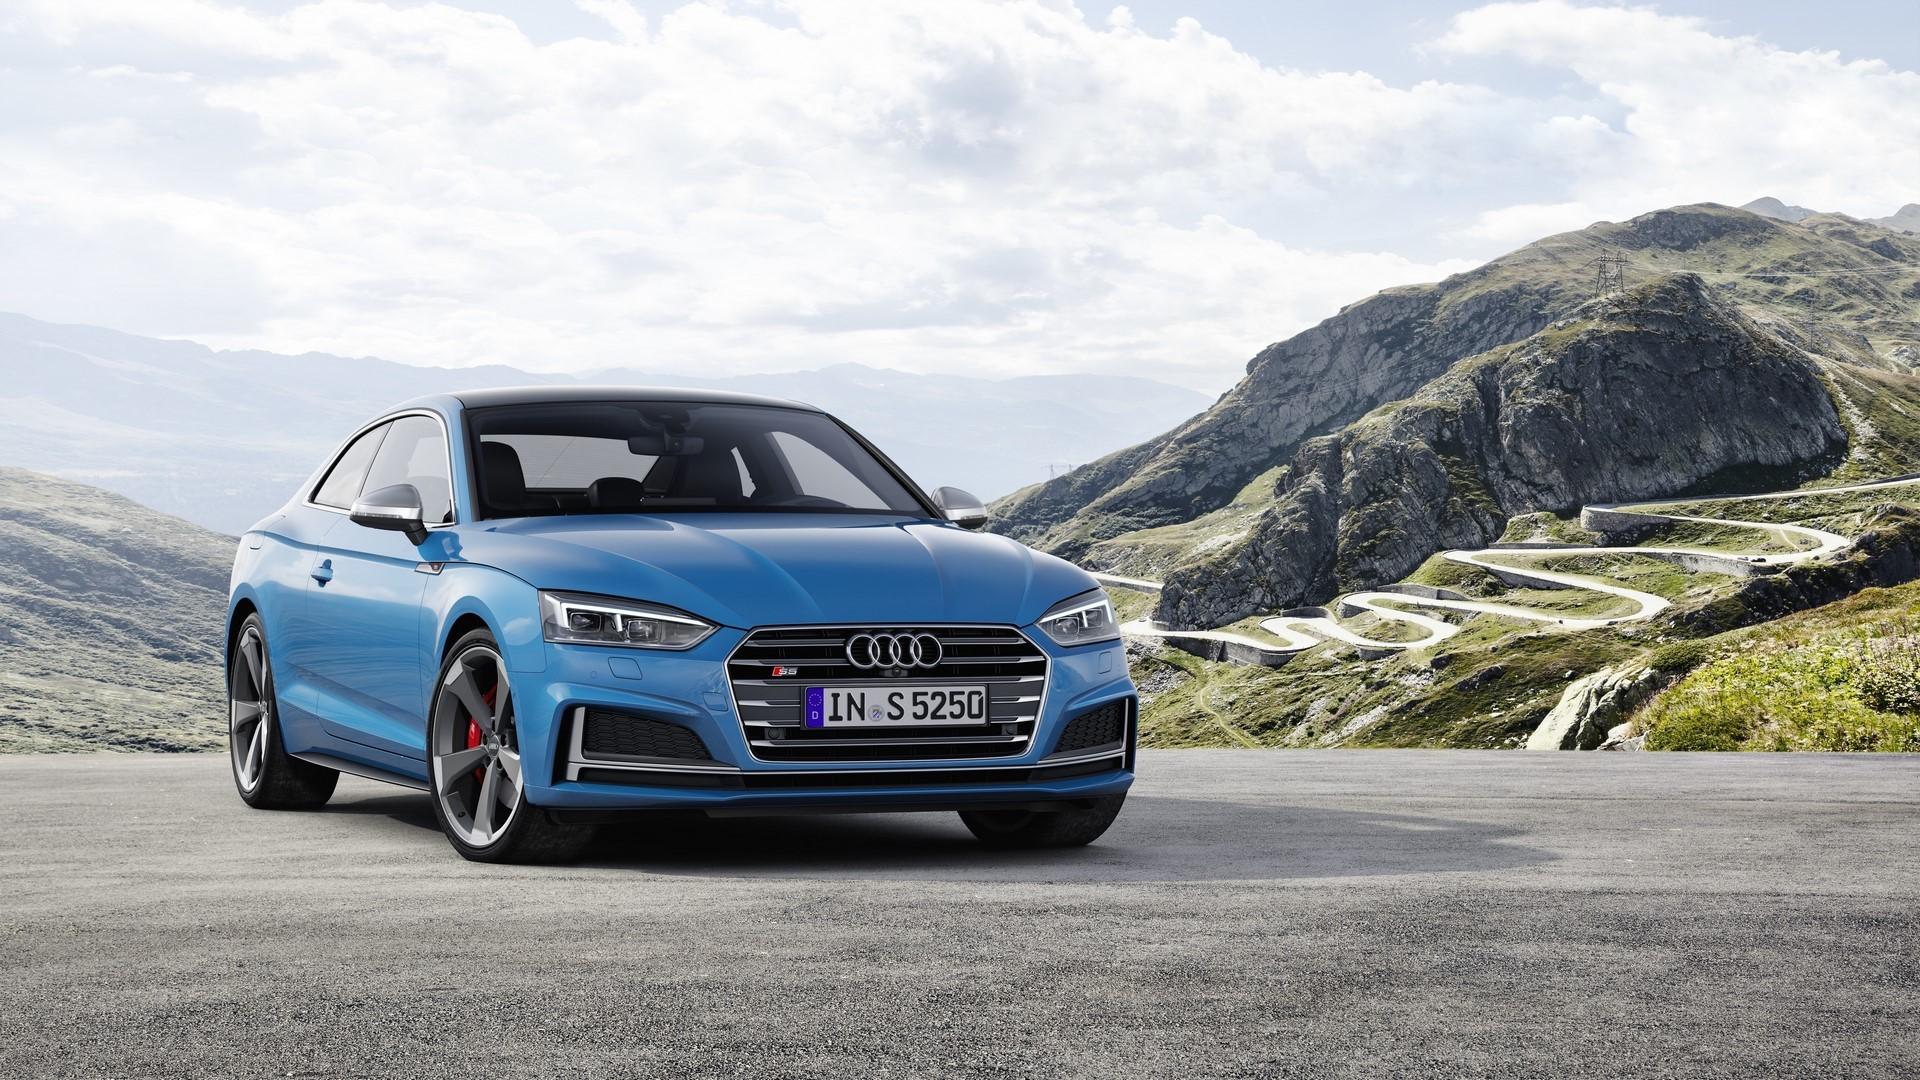 Audi-S5-TDI-Coupe-13